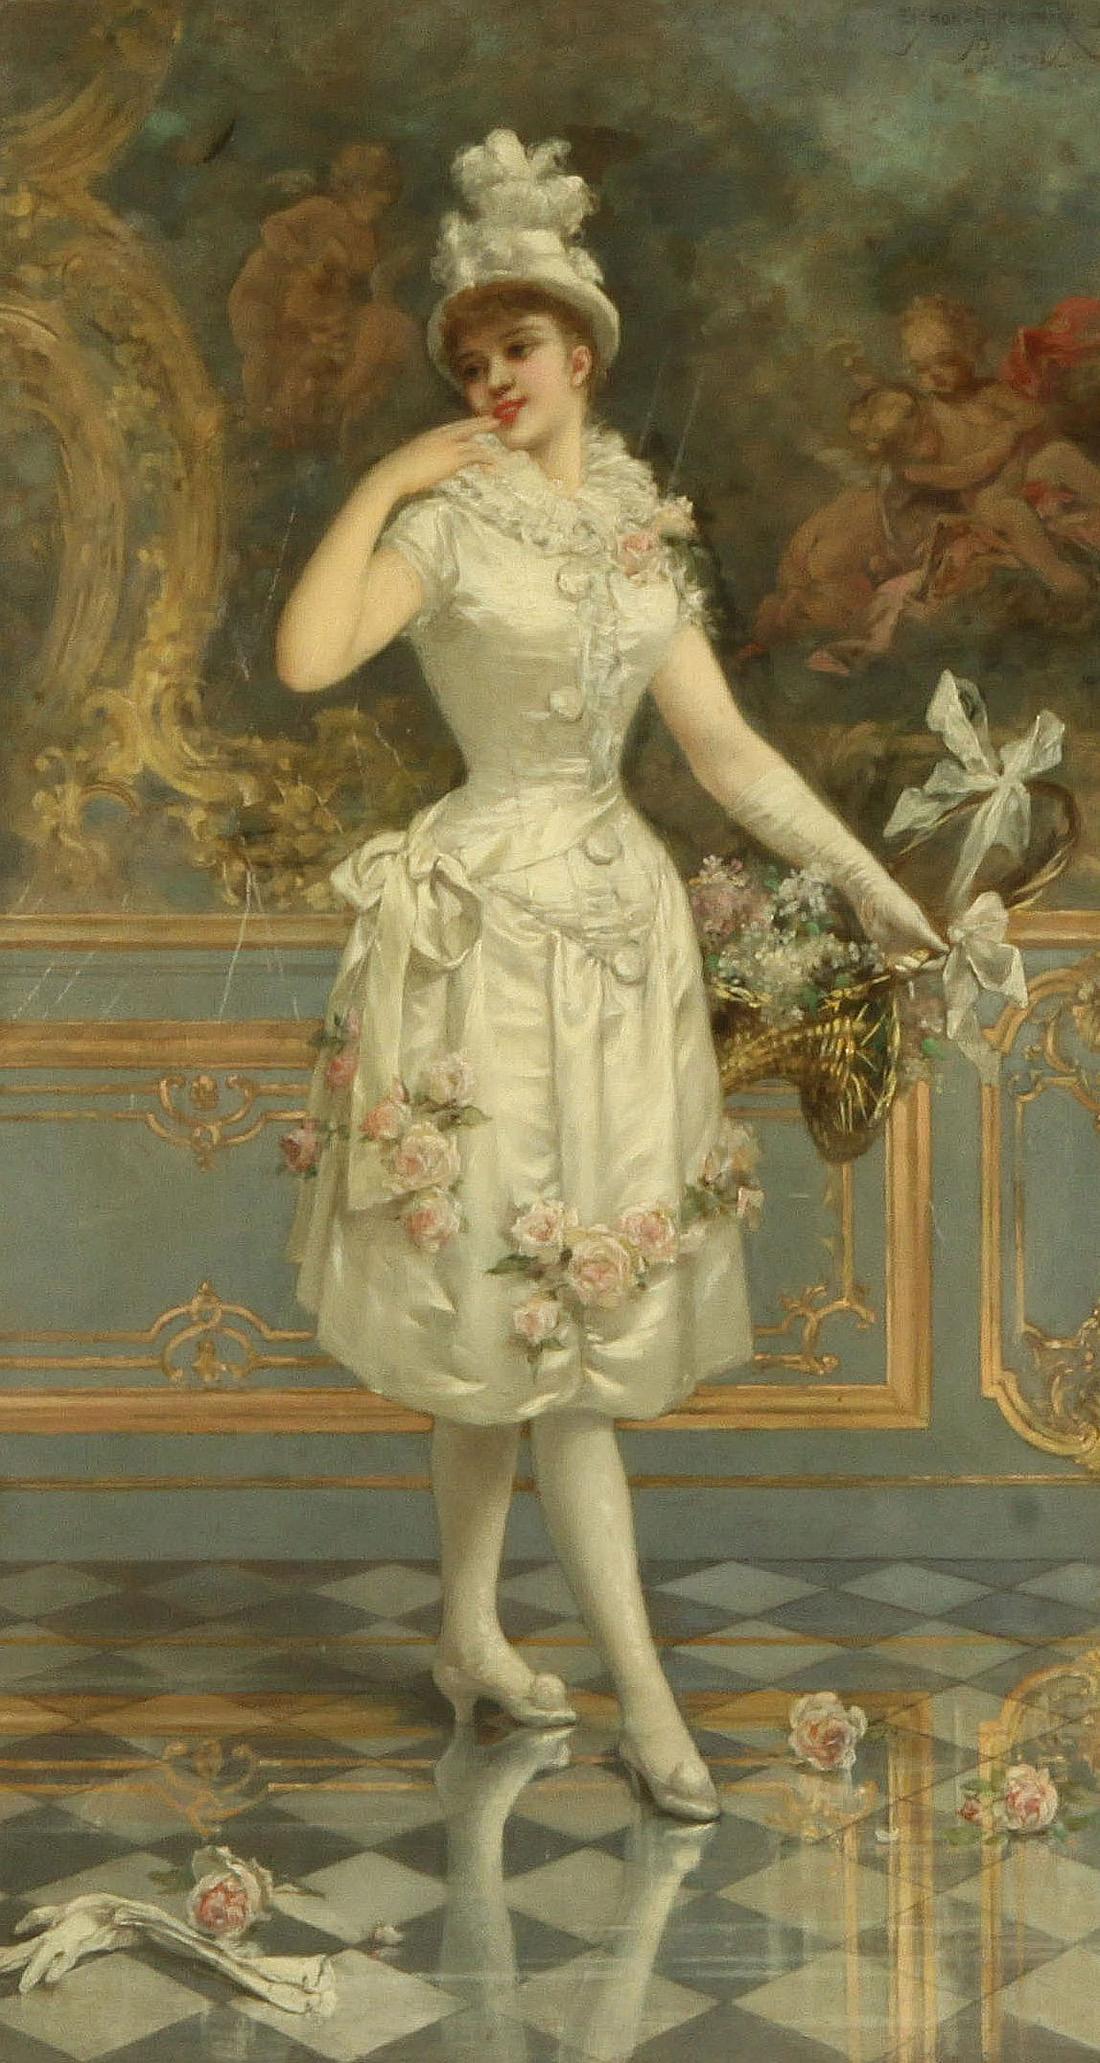 EMILE EISMAN SEMENOWSKY (1857-1911),